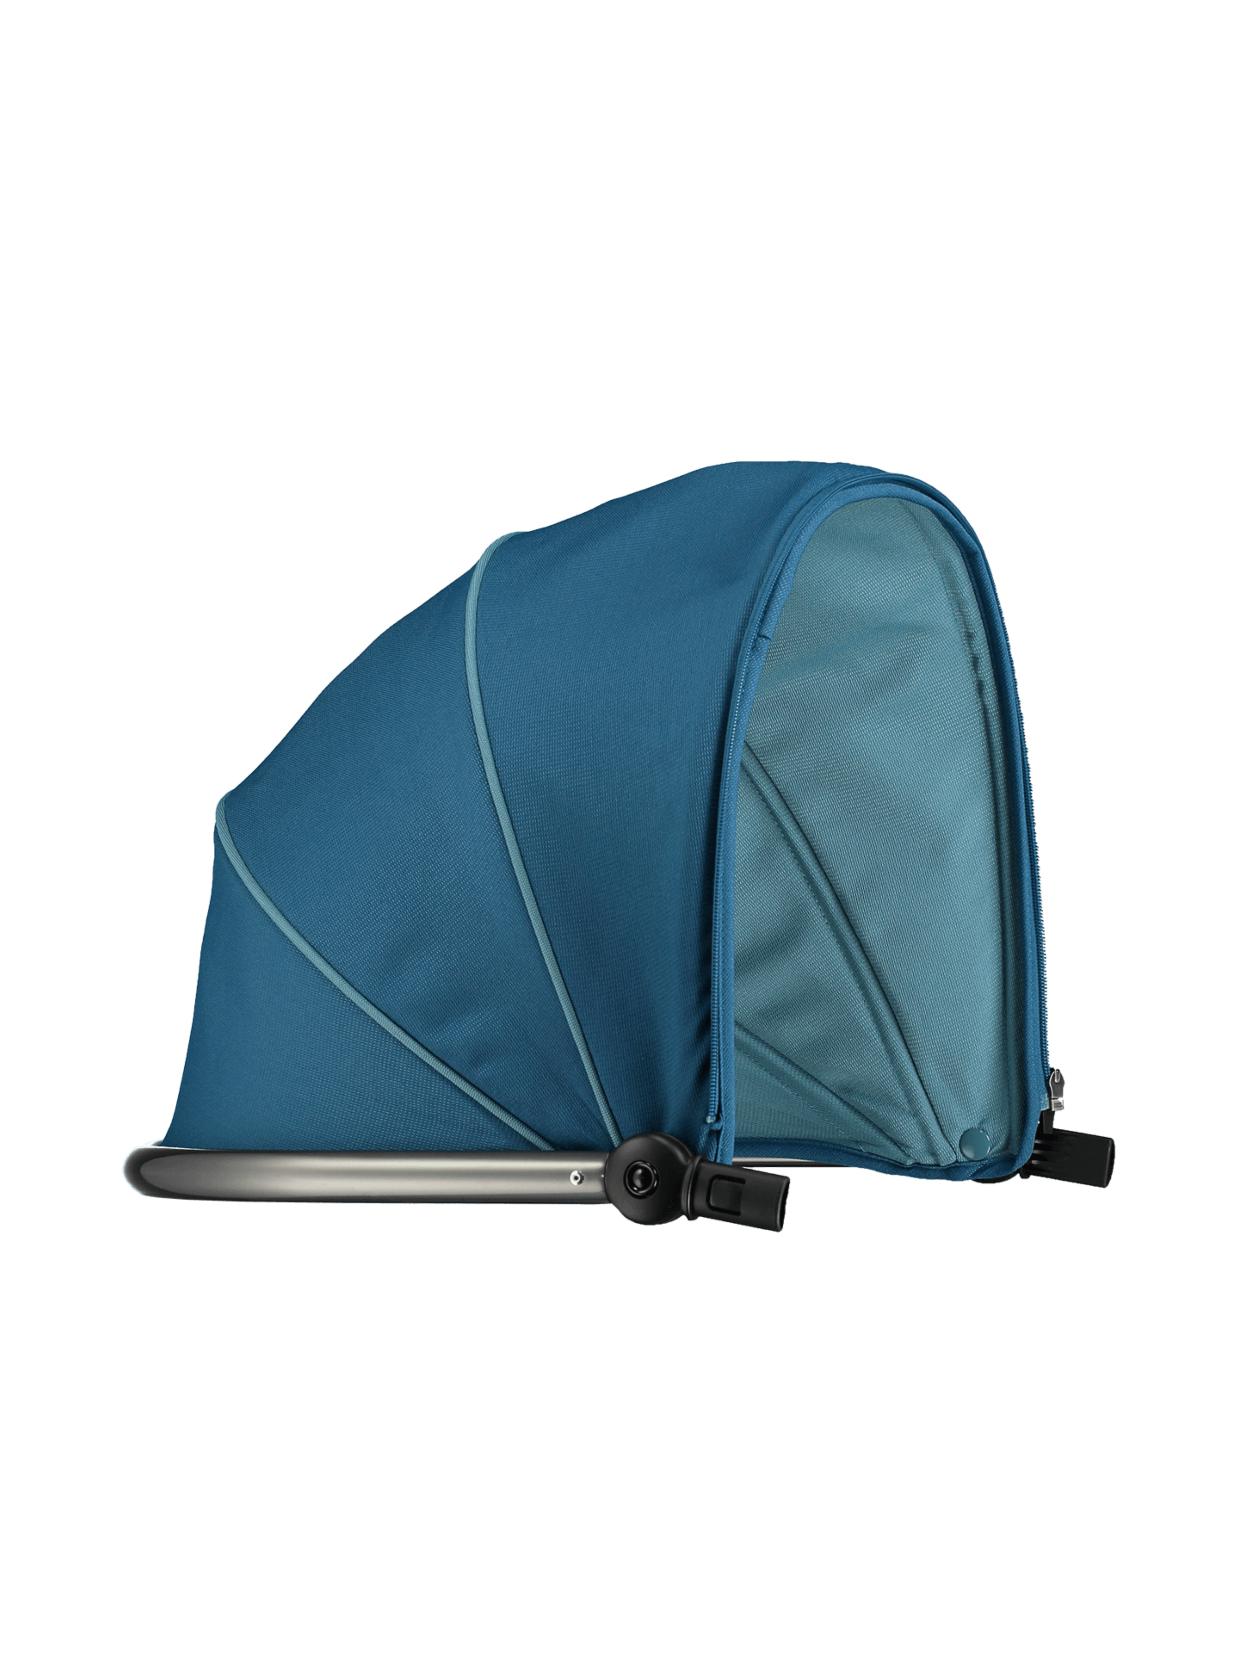 Peach Main Seat/Carrycot Hood - Peacock